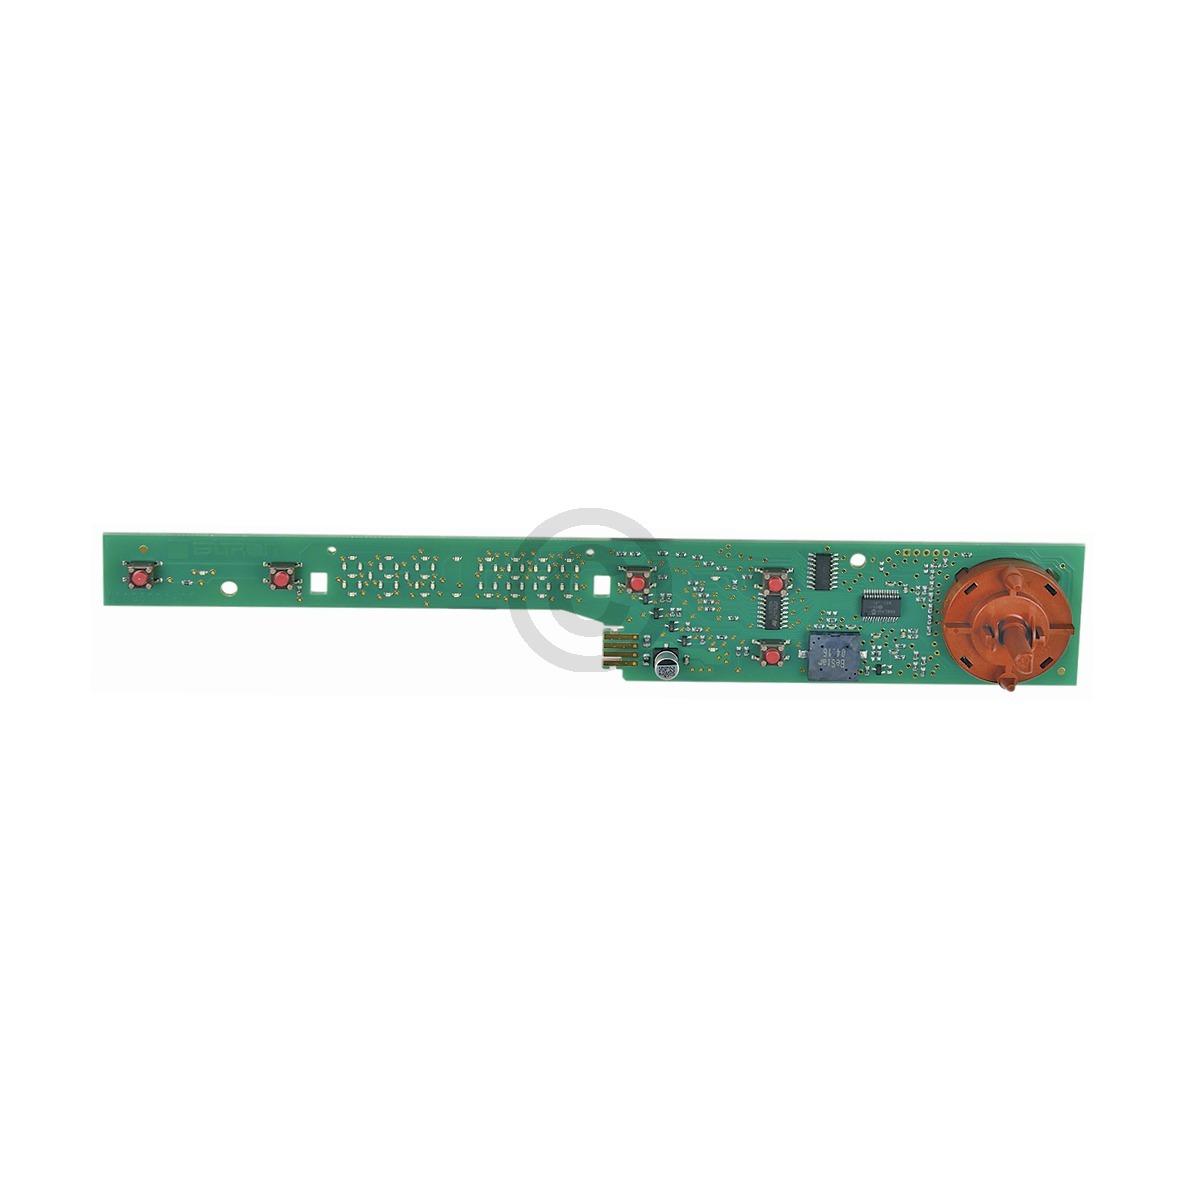 Elektronik Schaltbrett 41041466 Candy Hoover